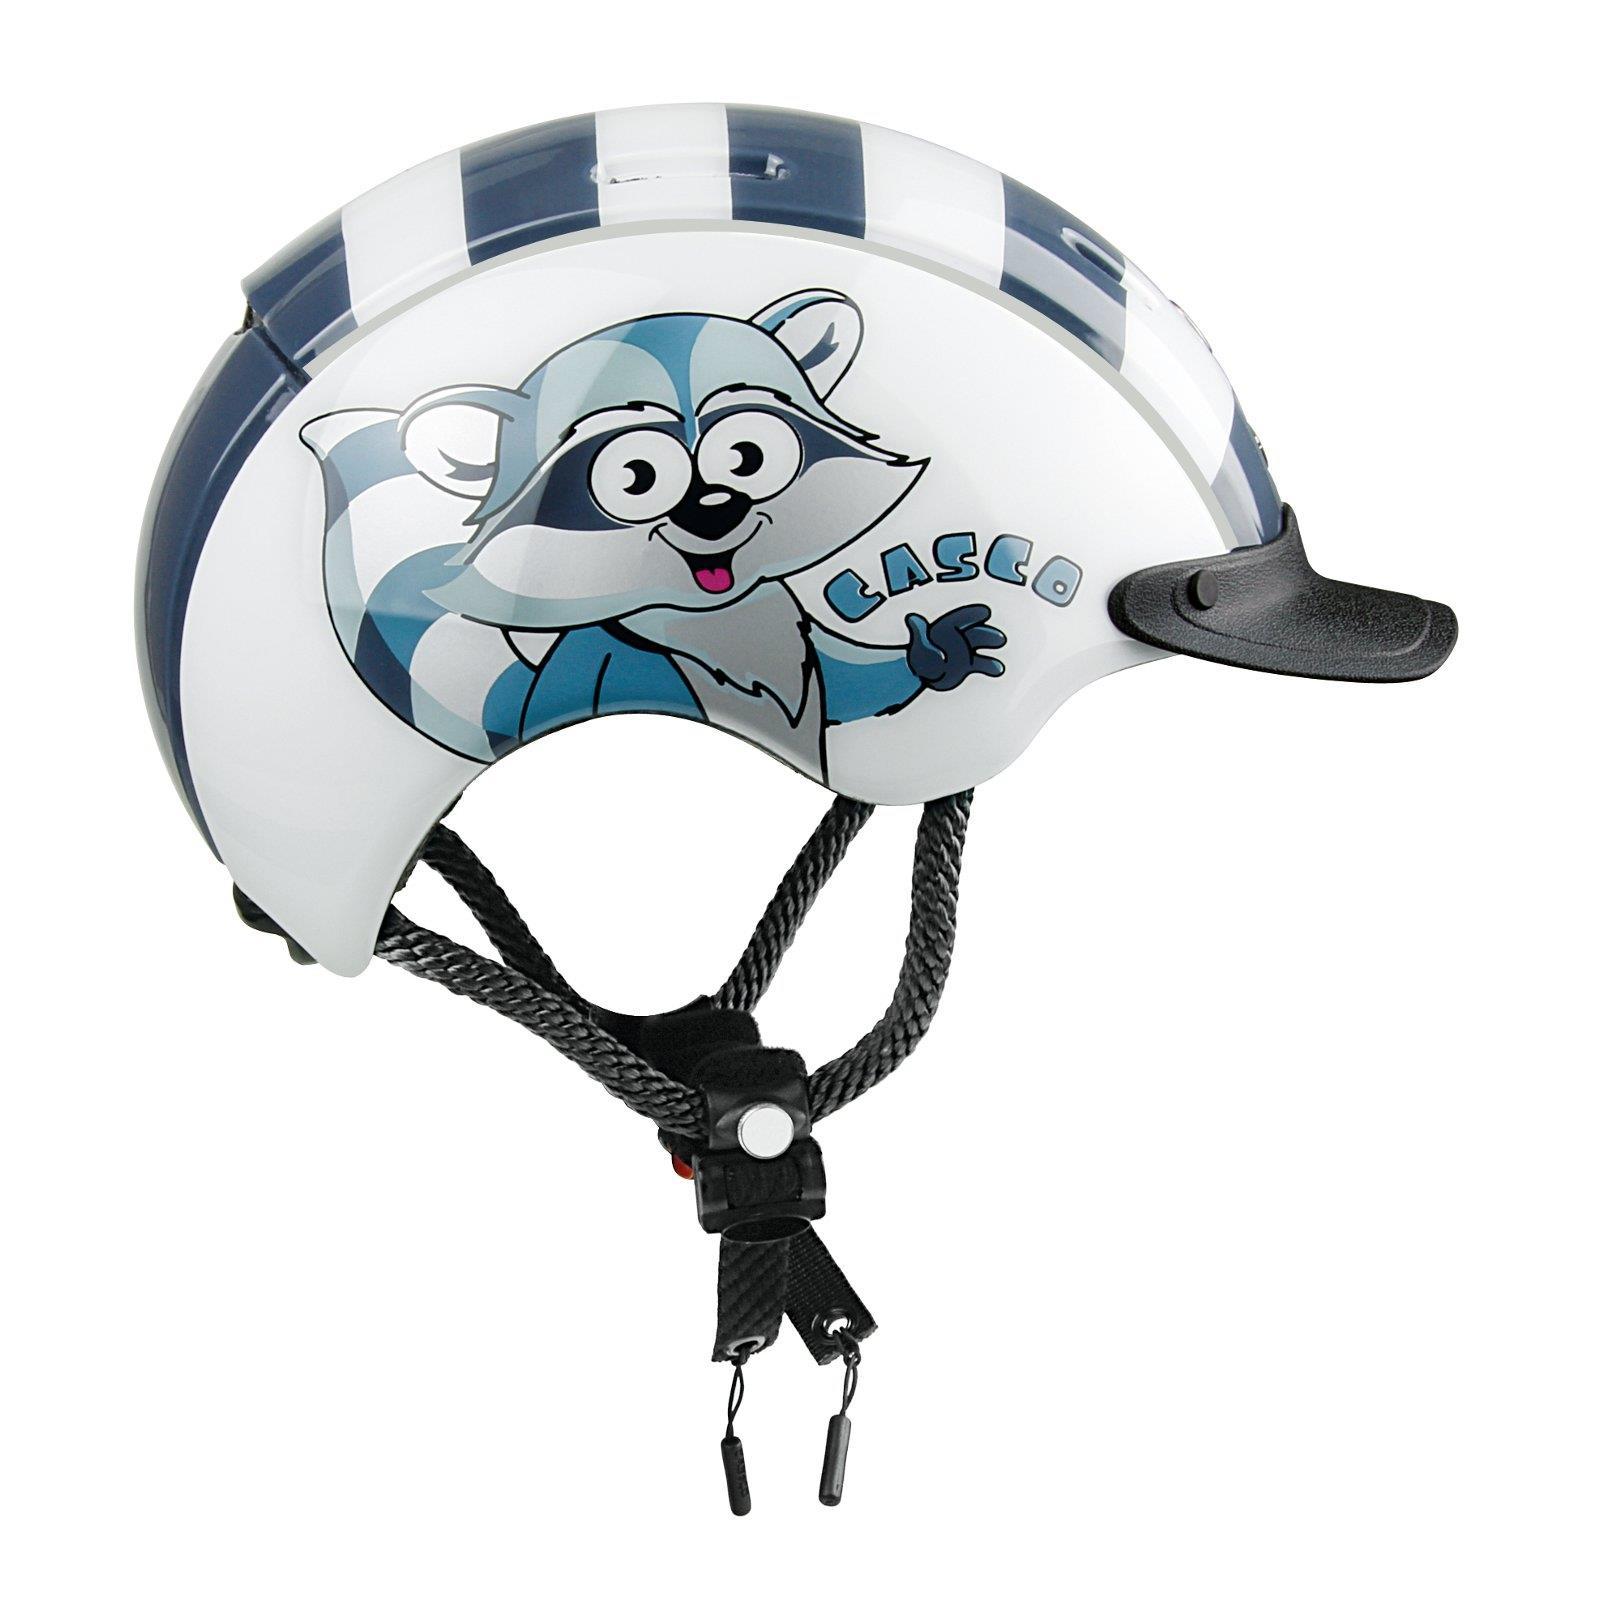 CASCO Kinder Helm Mini Generation Waschbaer Weiss Fahrrad